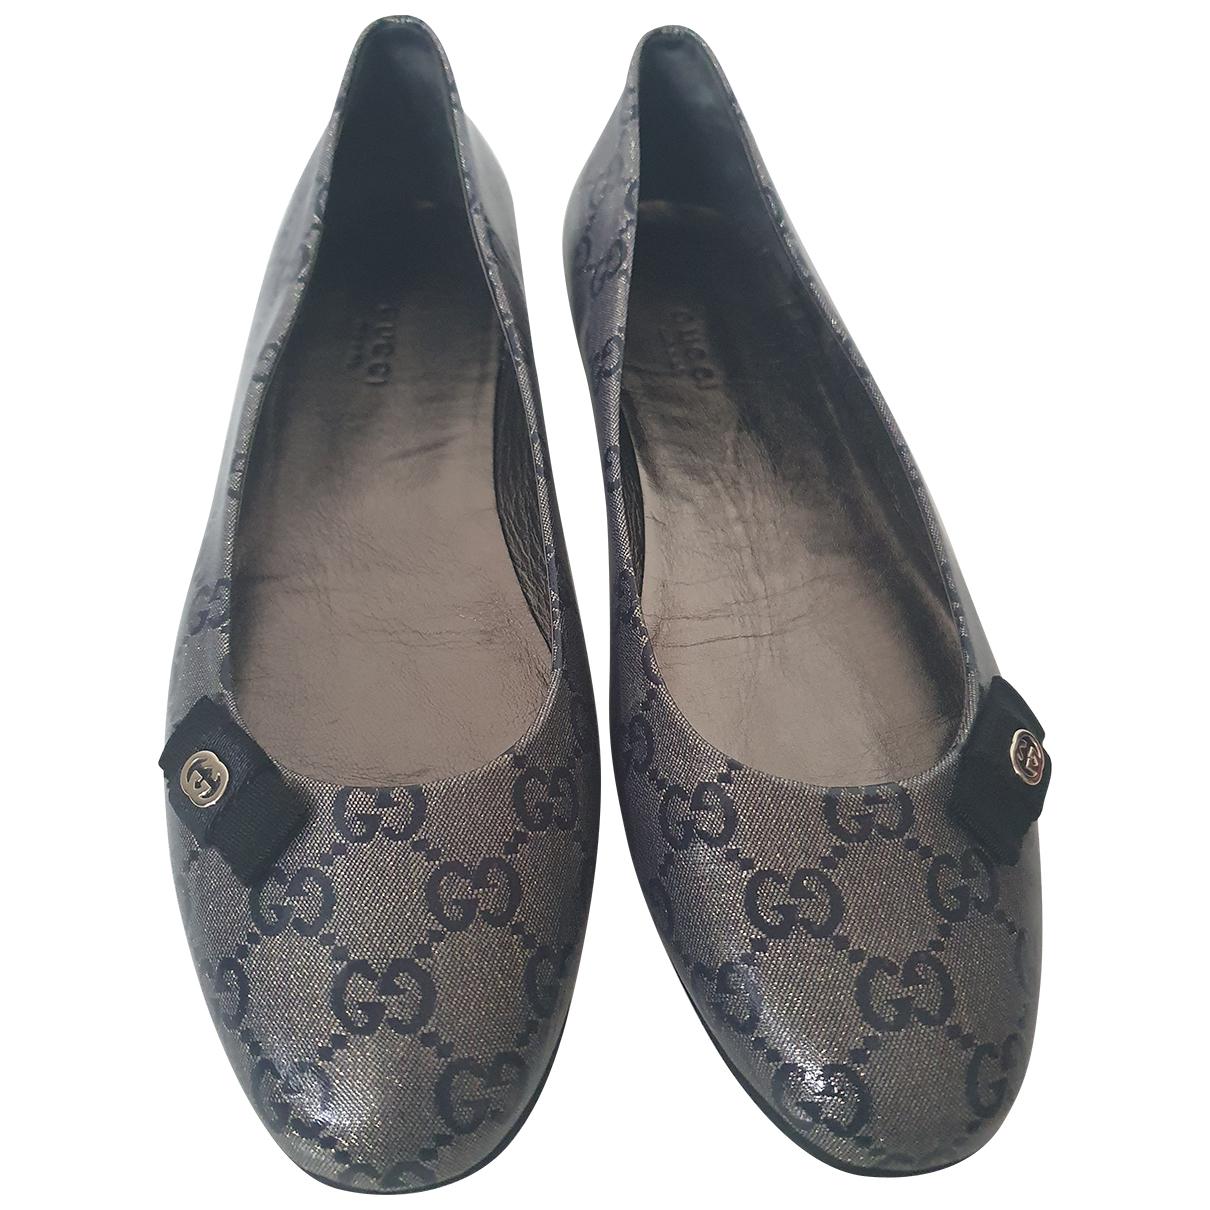 Gucci N Grey Leather Ballet flats for Women 38 EU